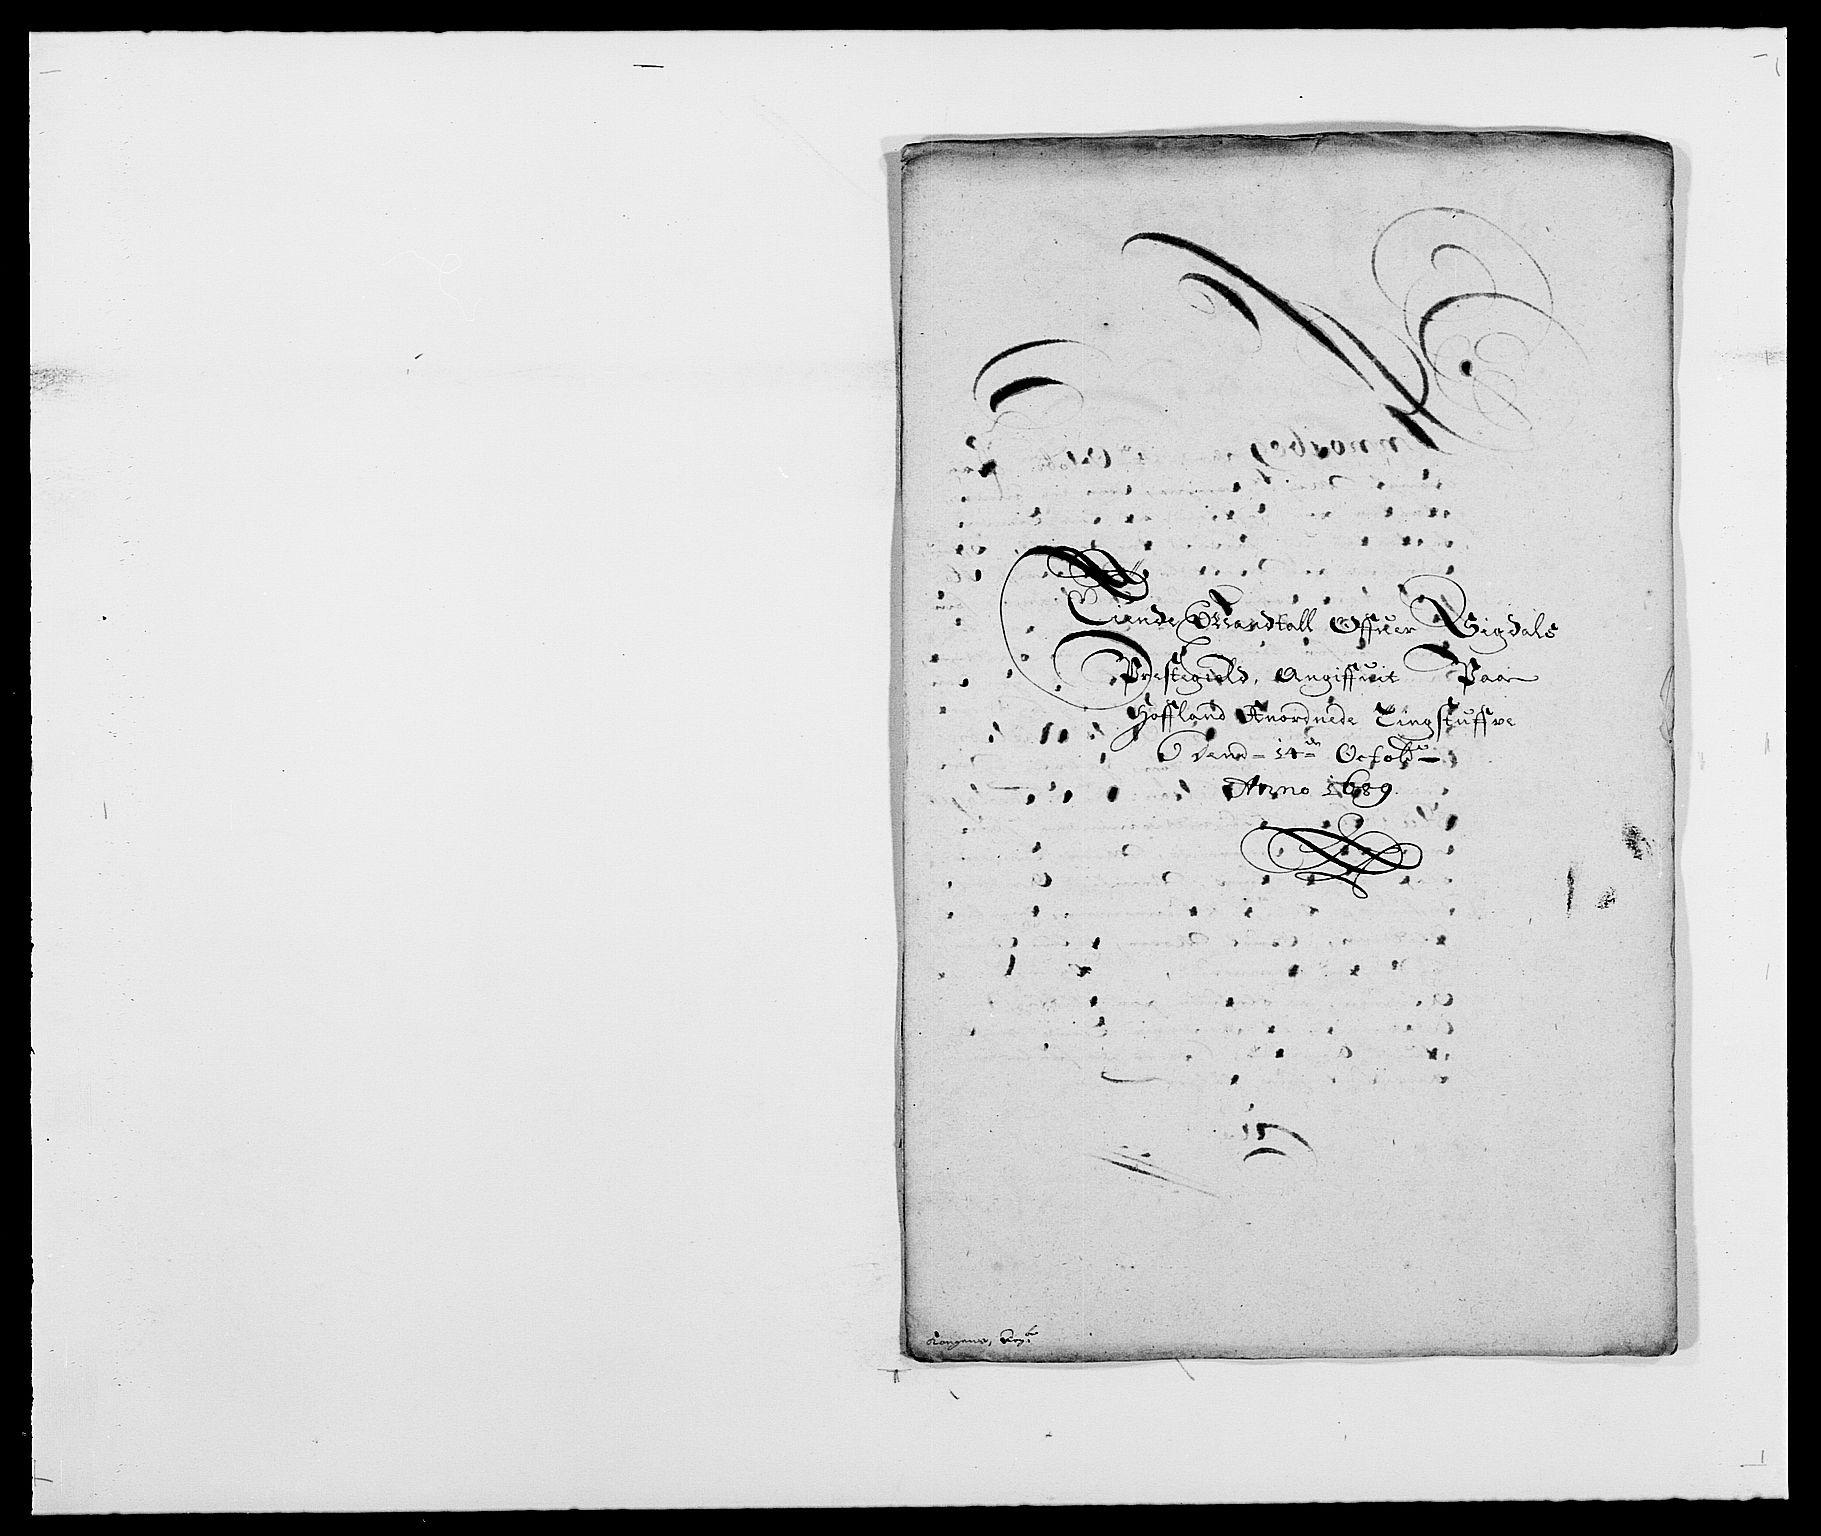 RA, Rentekammeret inntil 1814, Reviderte regnskaper, Fogderegnskap, R25/L1680: Fogderegnskap Buskerud, 1689-1690, s. 39